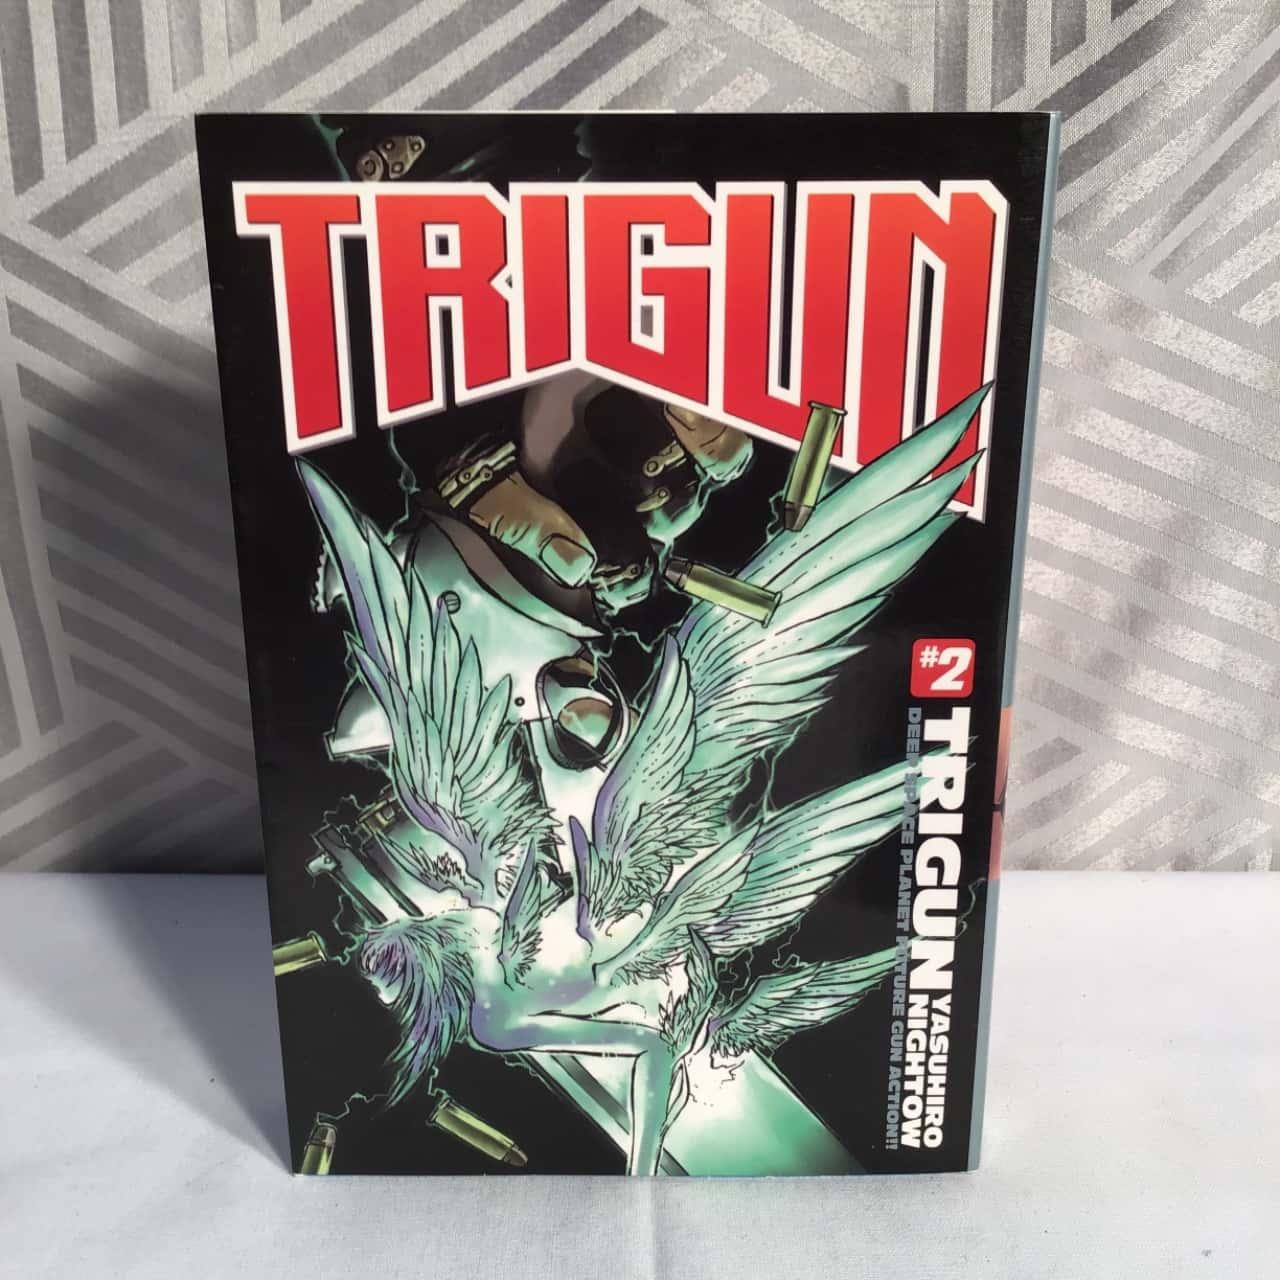 Trigun #2 Deep Space Planet Future Gun Action!!